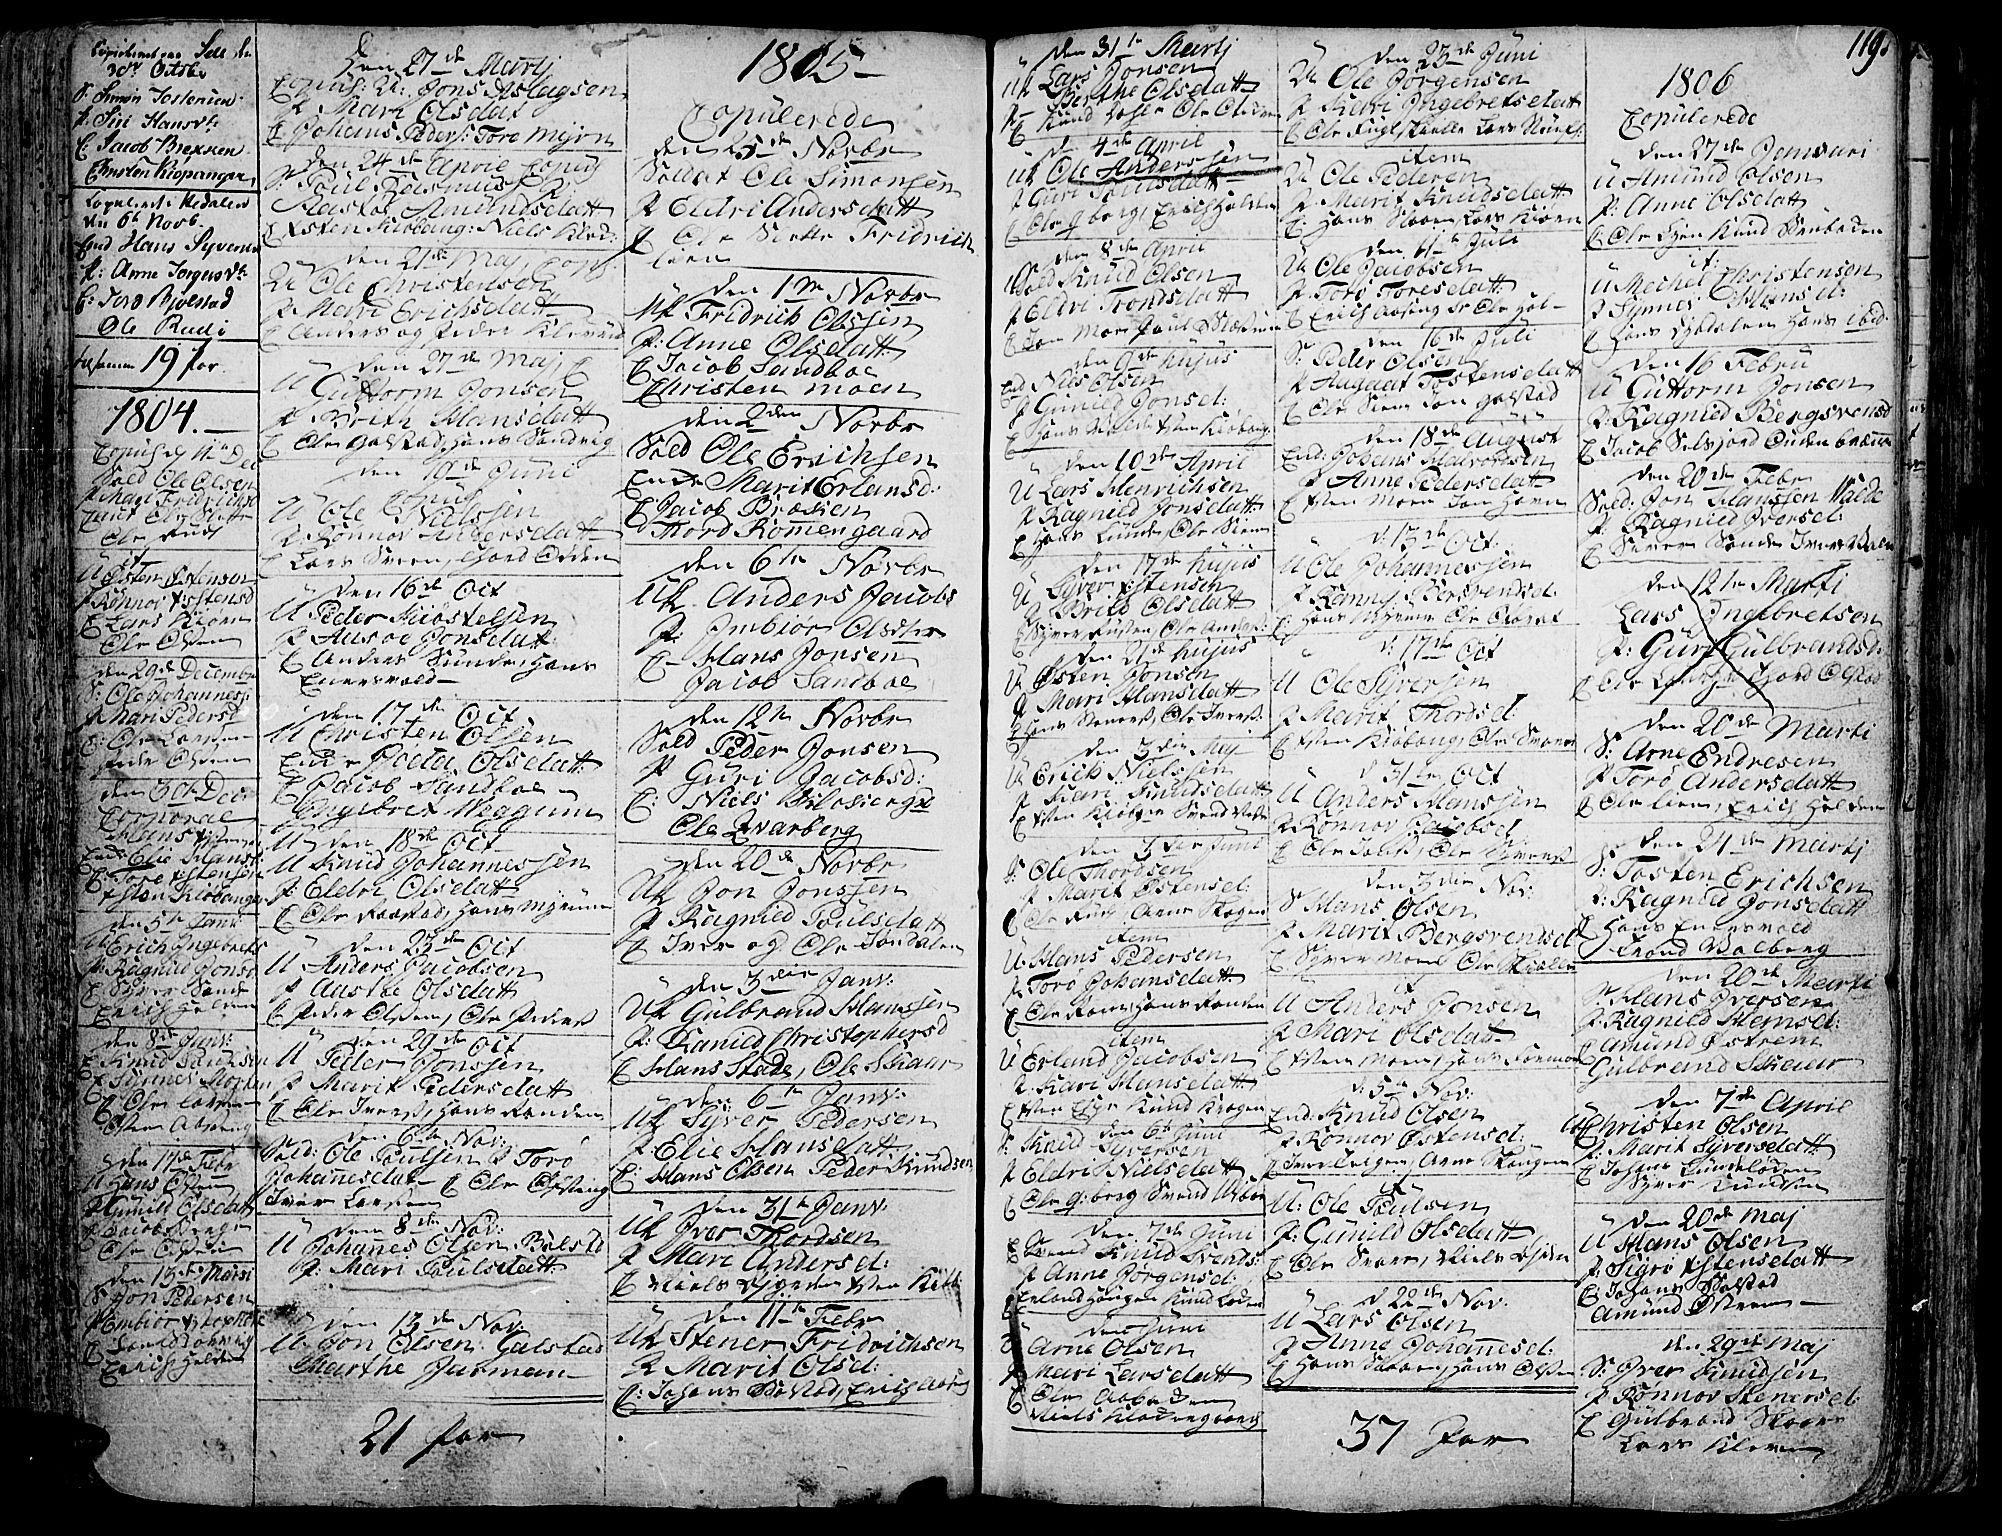 SAH, Vågå prestekontor, Ministerialbok nr. 1, 1739-1810, s. 119